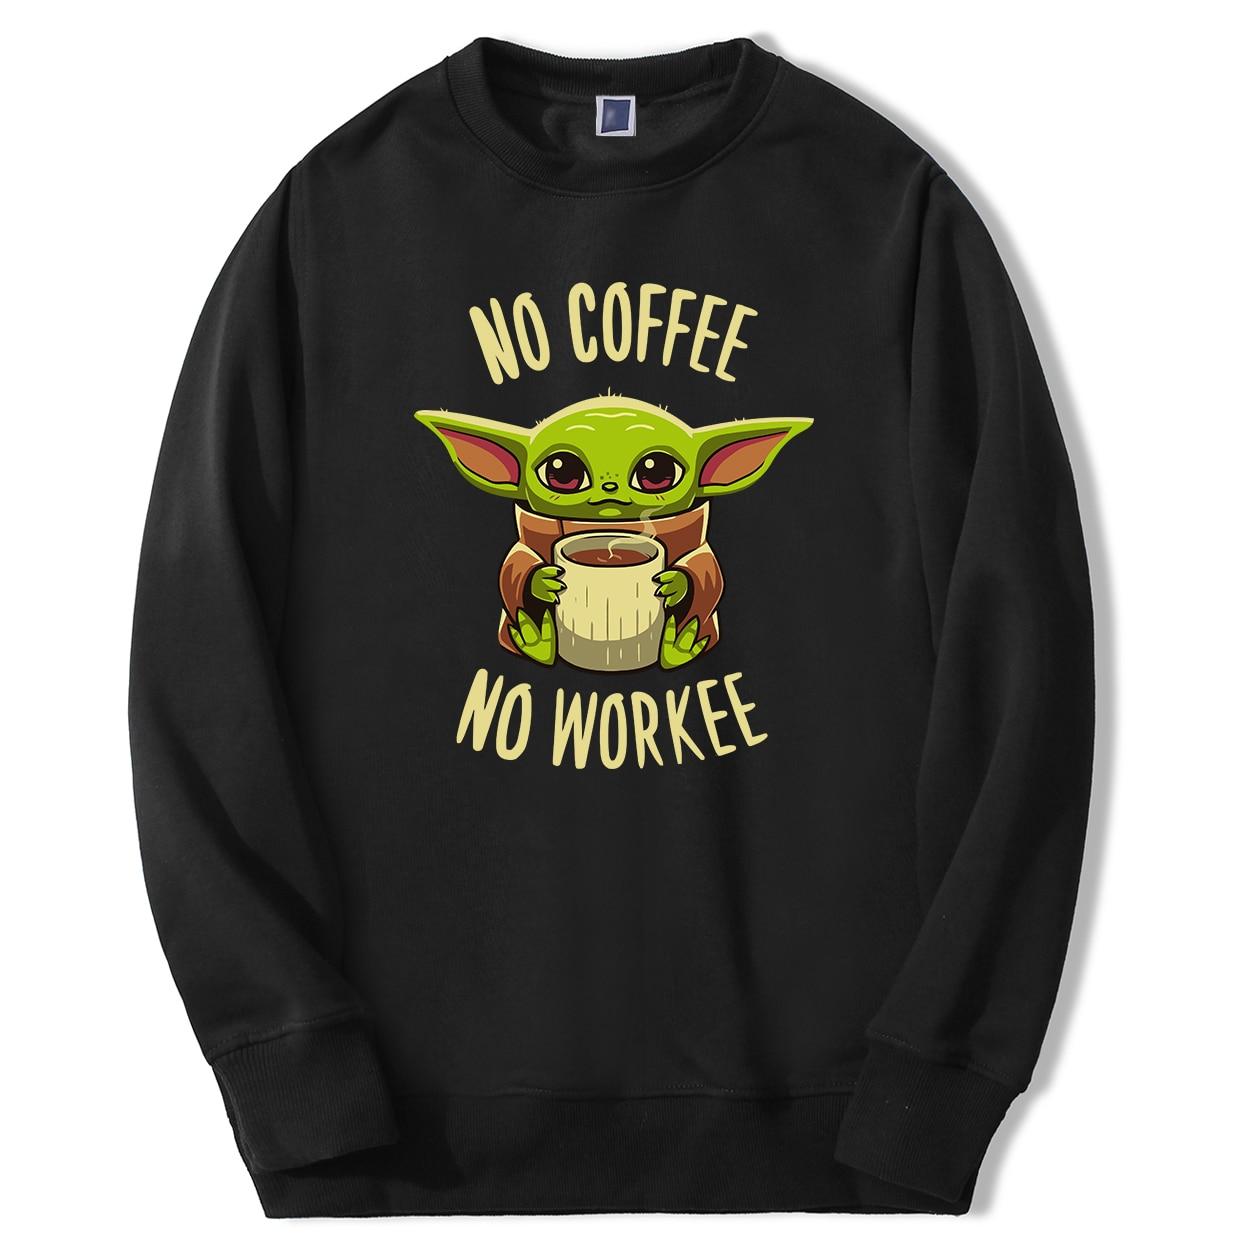 The Mandalorian Men's Sweatshirts Cute Baby Yoda Nocoffee No Workee Male Hoodies Sweatshirts 2020 Spring Autumn Hoody Sweatshirt